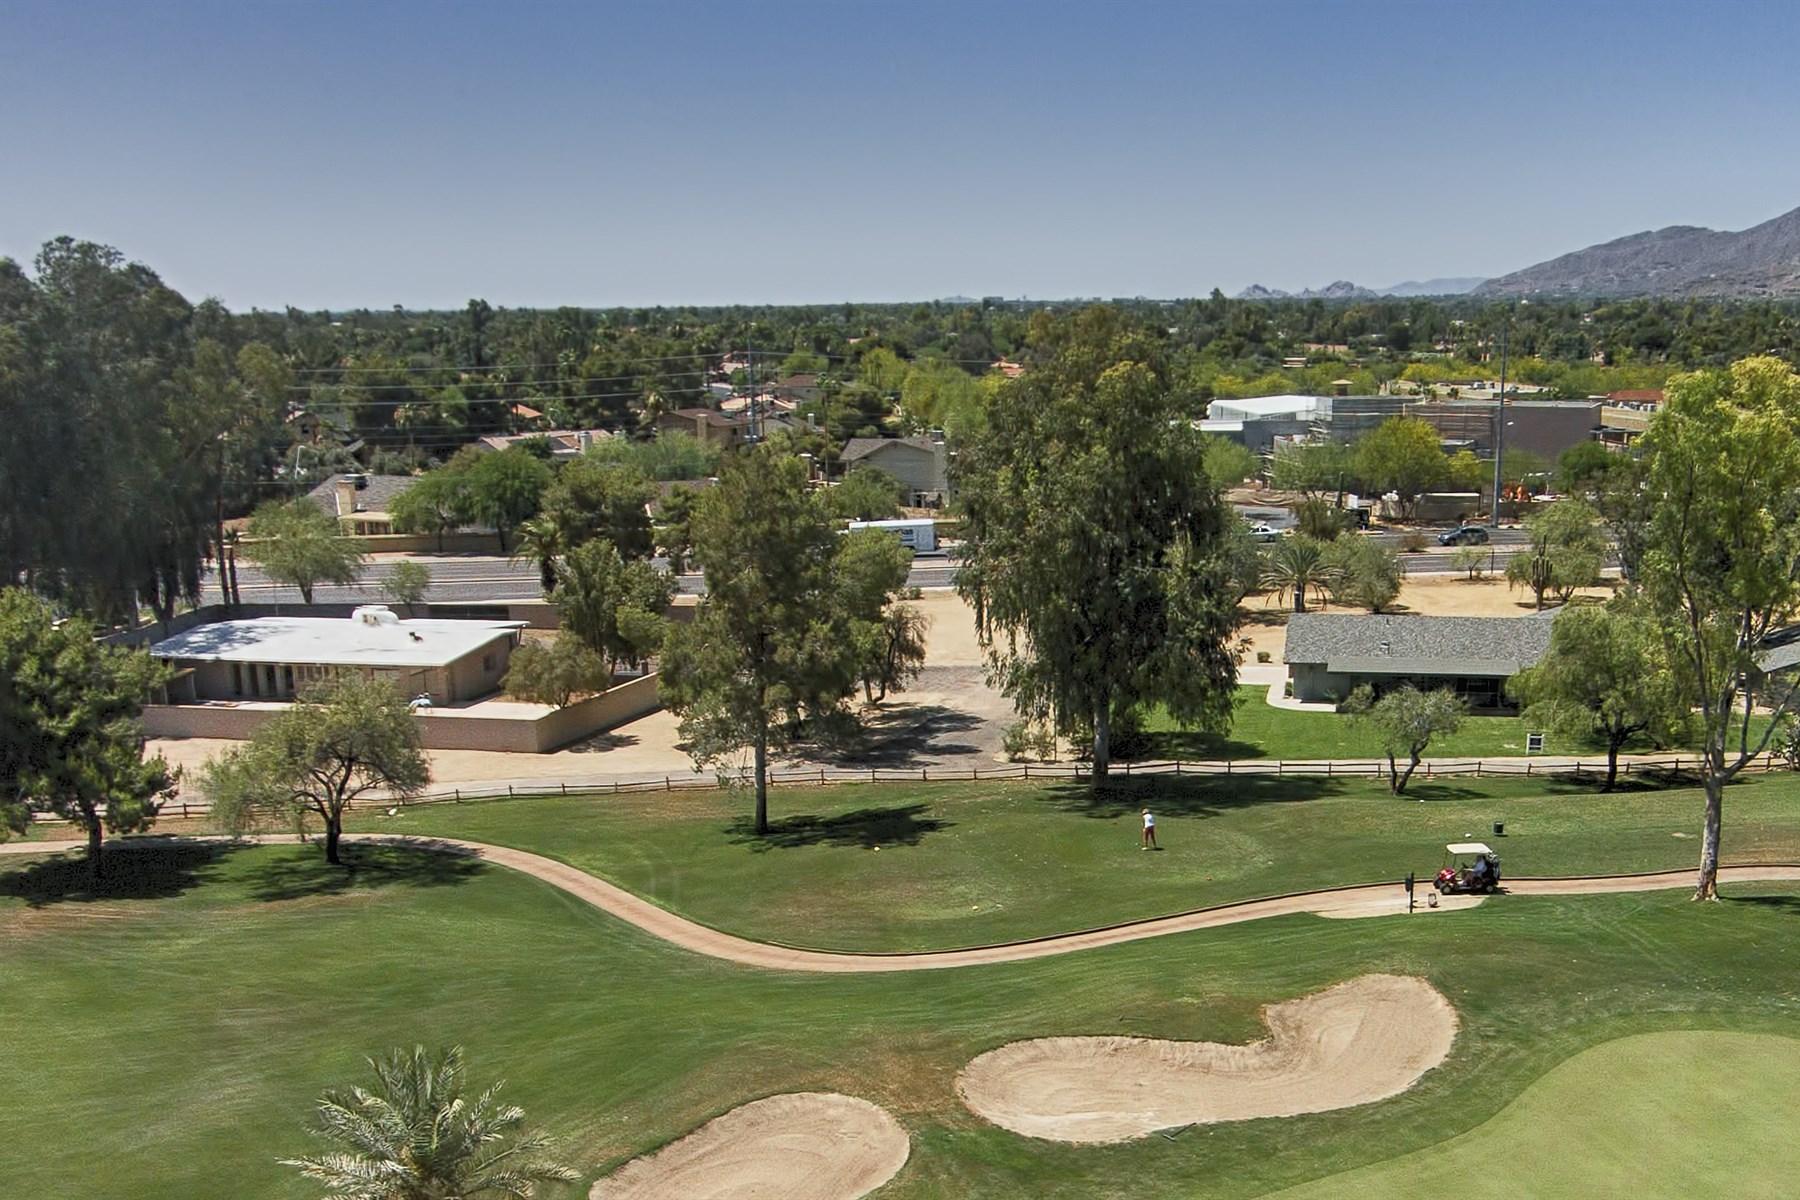 Casa para uma família para Venda às 1+ Acre Located In One Of The Best Locations In North Central Scottsdale 7632 E Shea Blvd Scottsdale, Arizona 85260 Estados Unidos